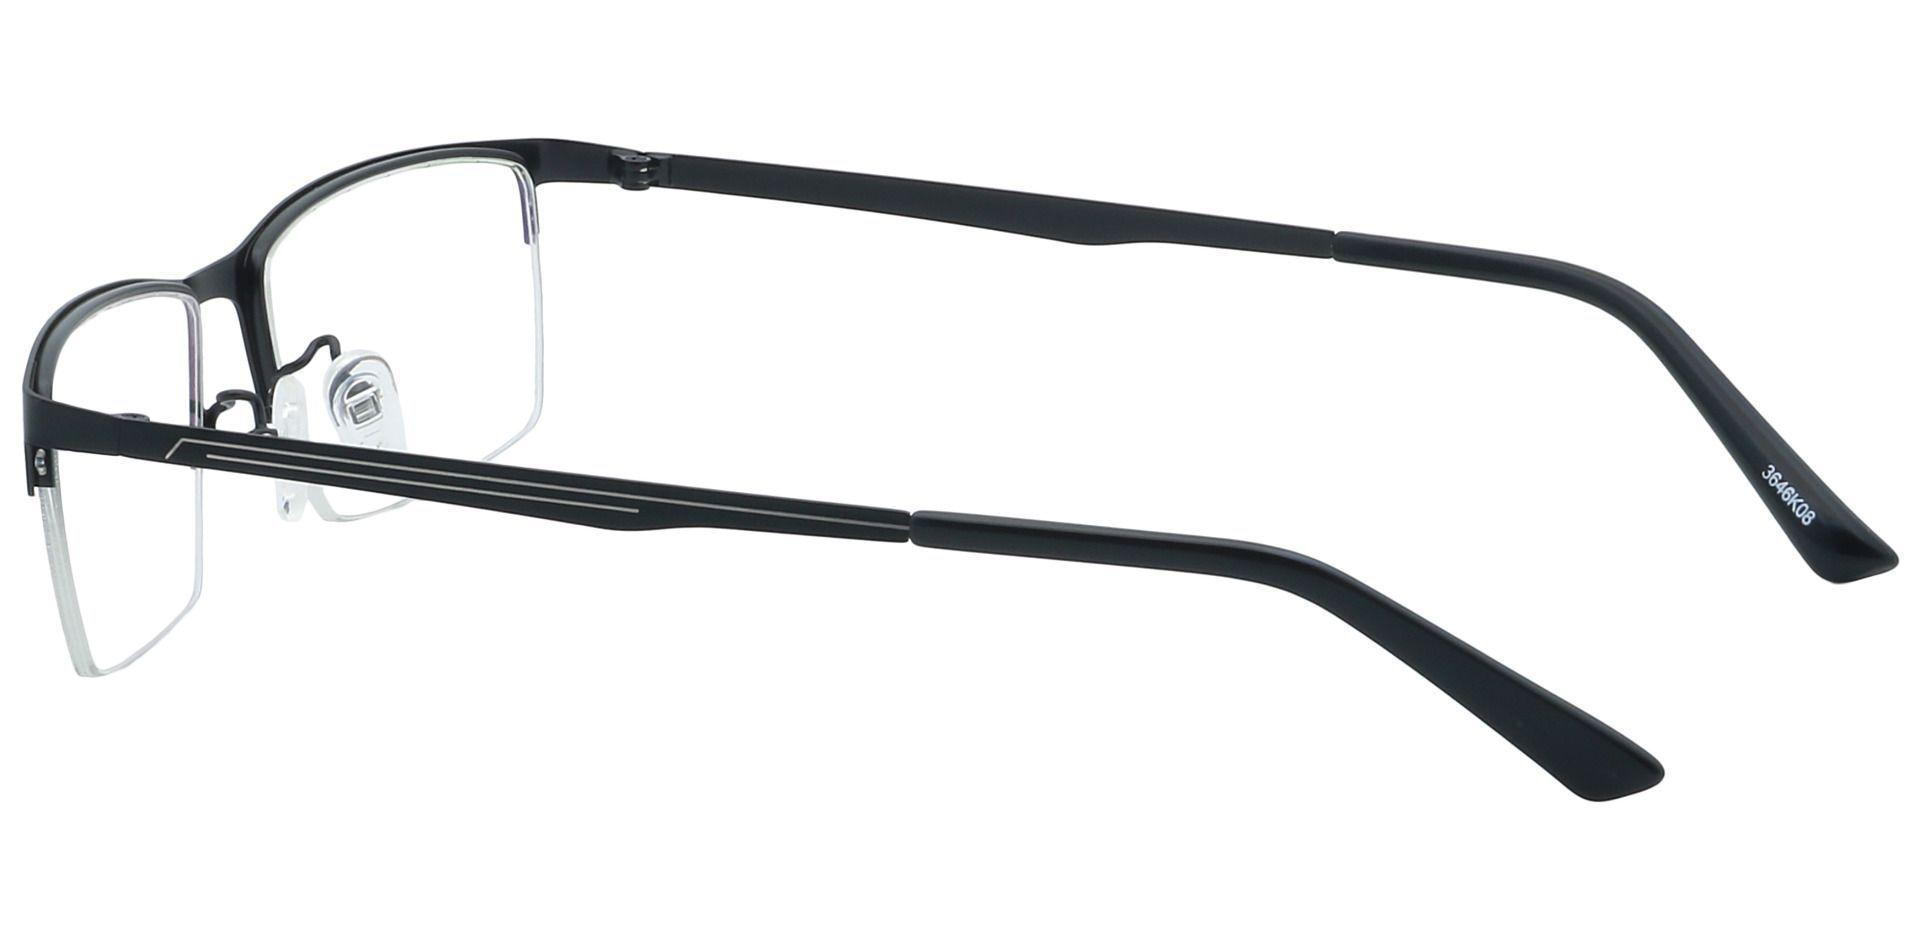 Lombard Rectangle Progressive Glasses - Black